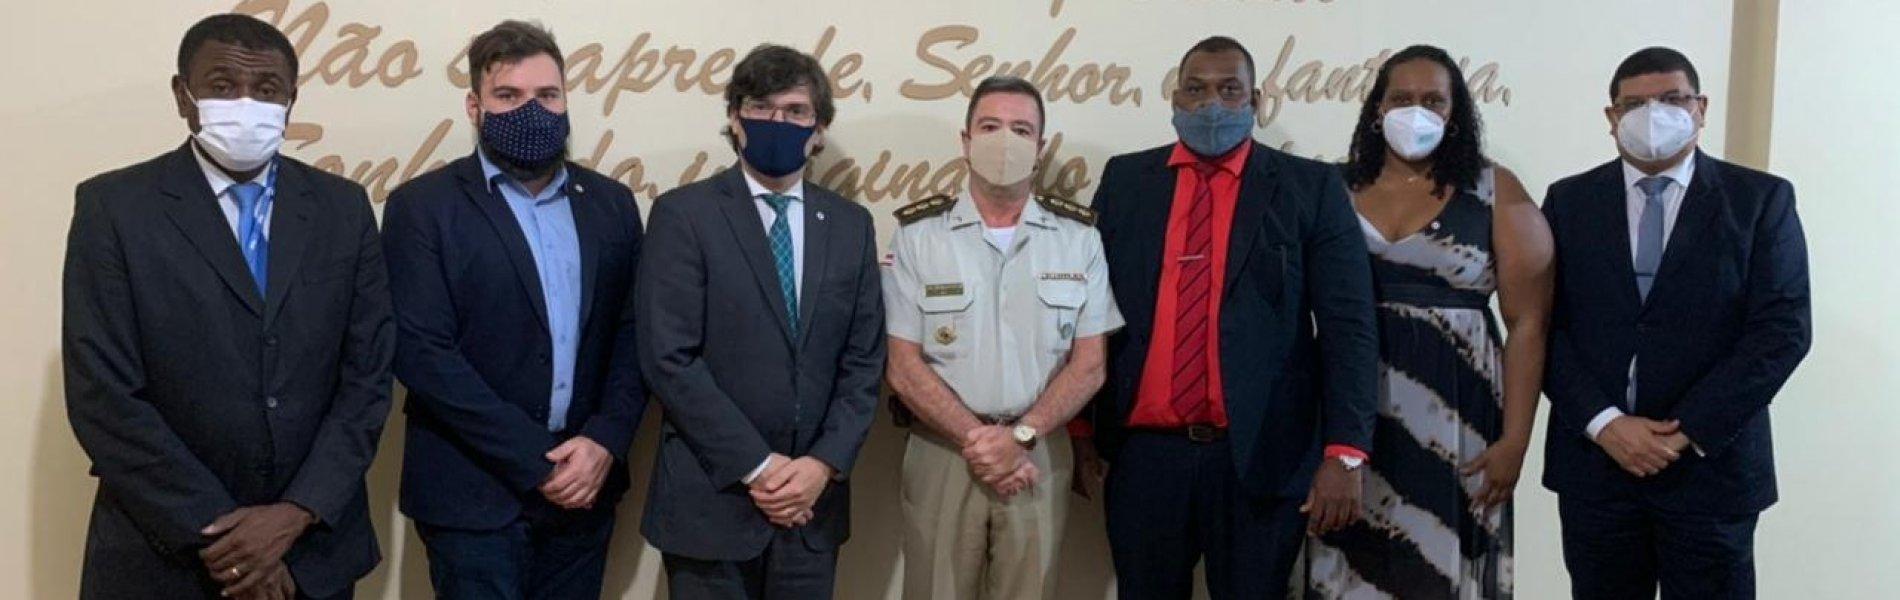 [Eugenio Raúl Zaffaroni faz abertura da Conferência Estadual da Advocacia Baiana 2021]